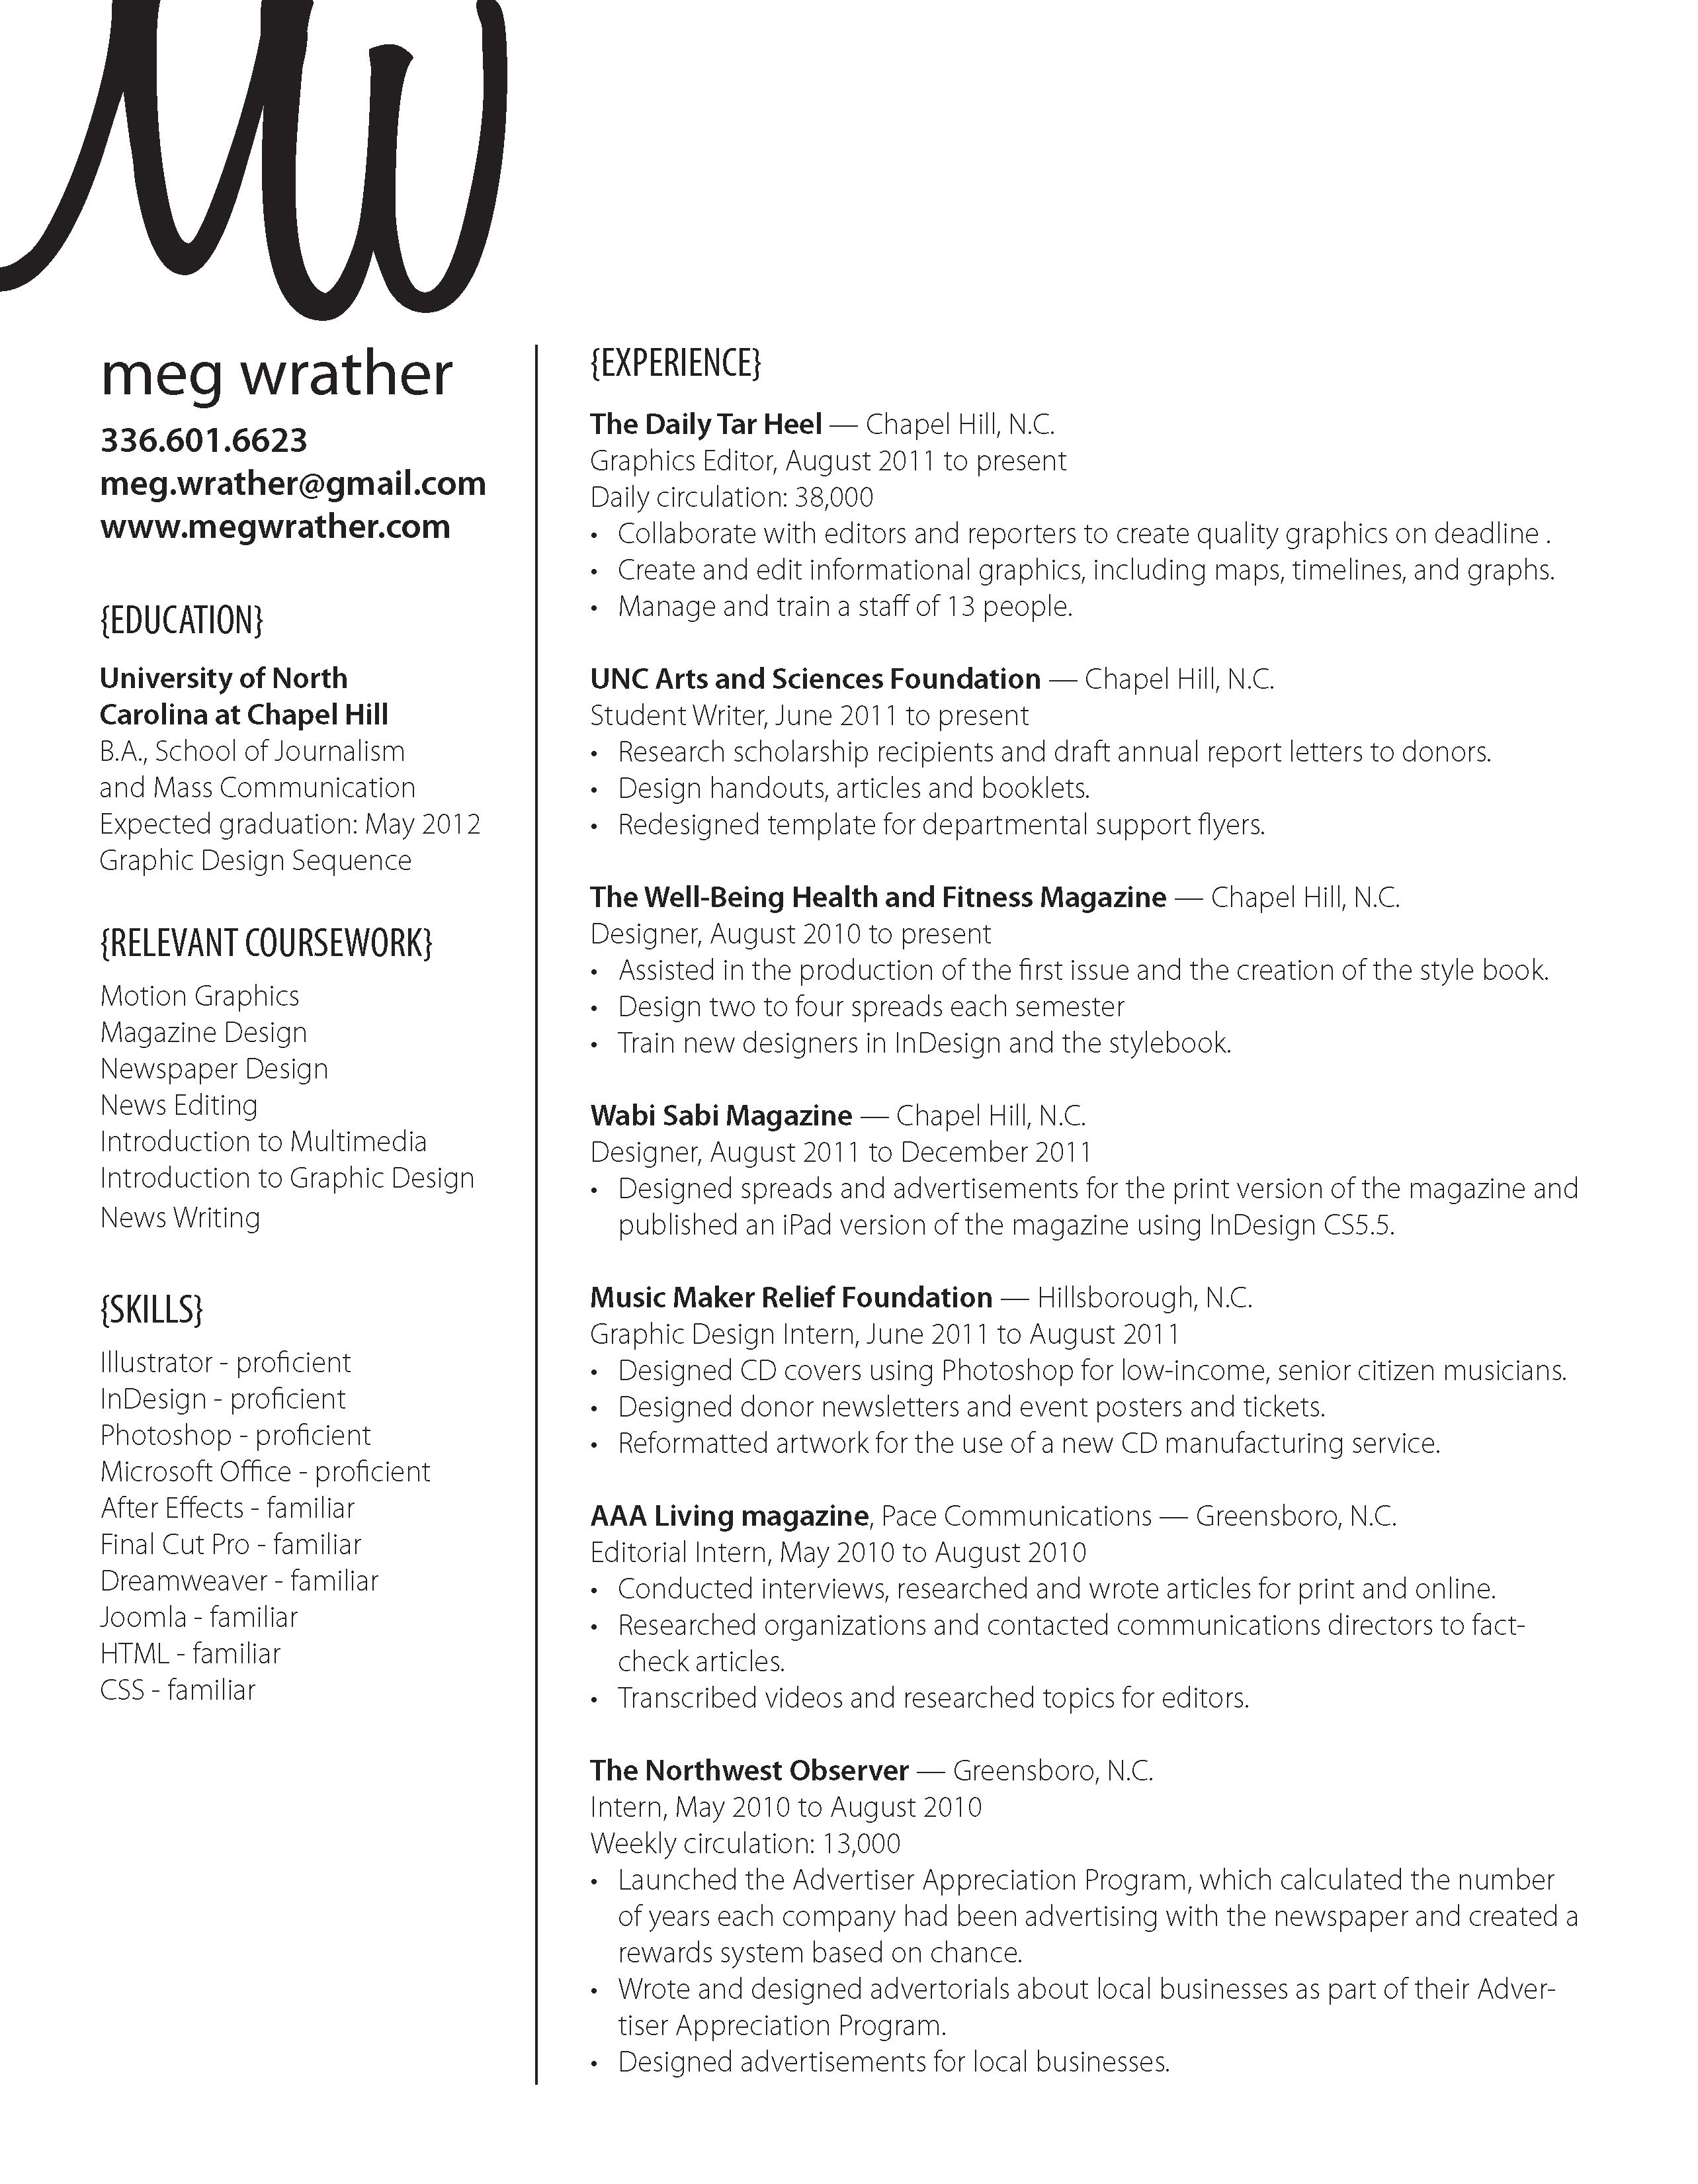 Meg Wrather With Images Resume Design Informative Resume